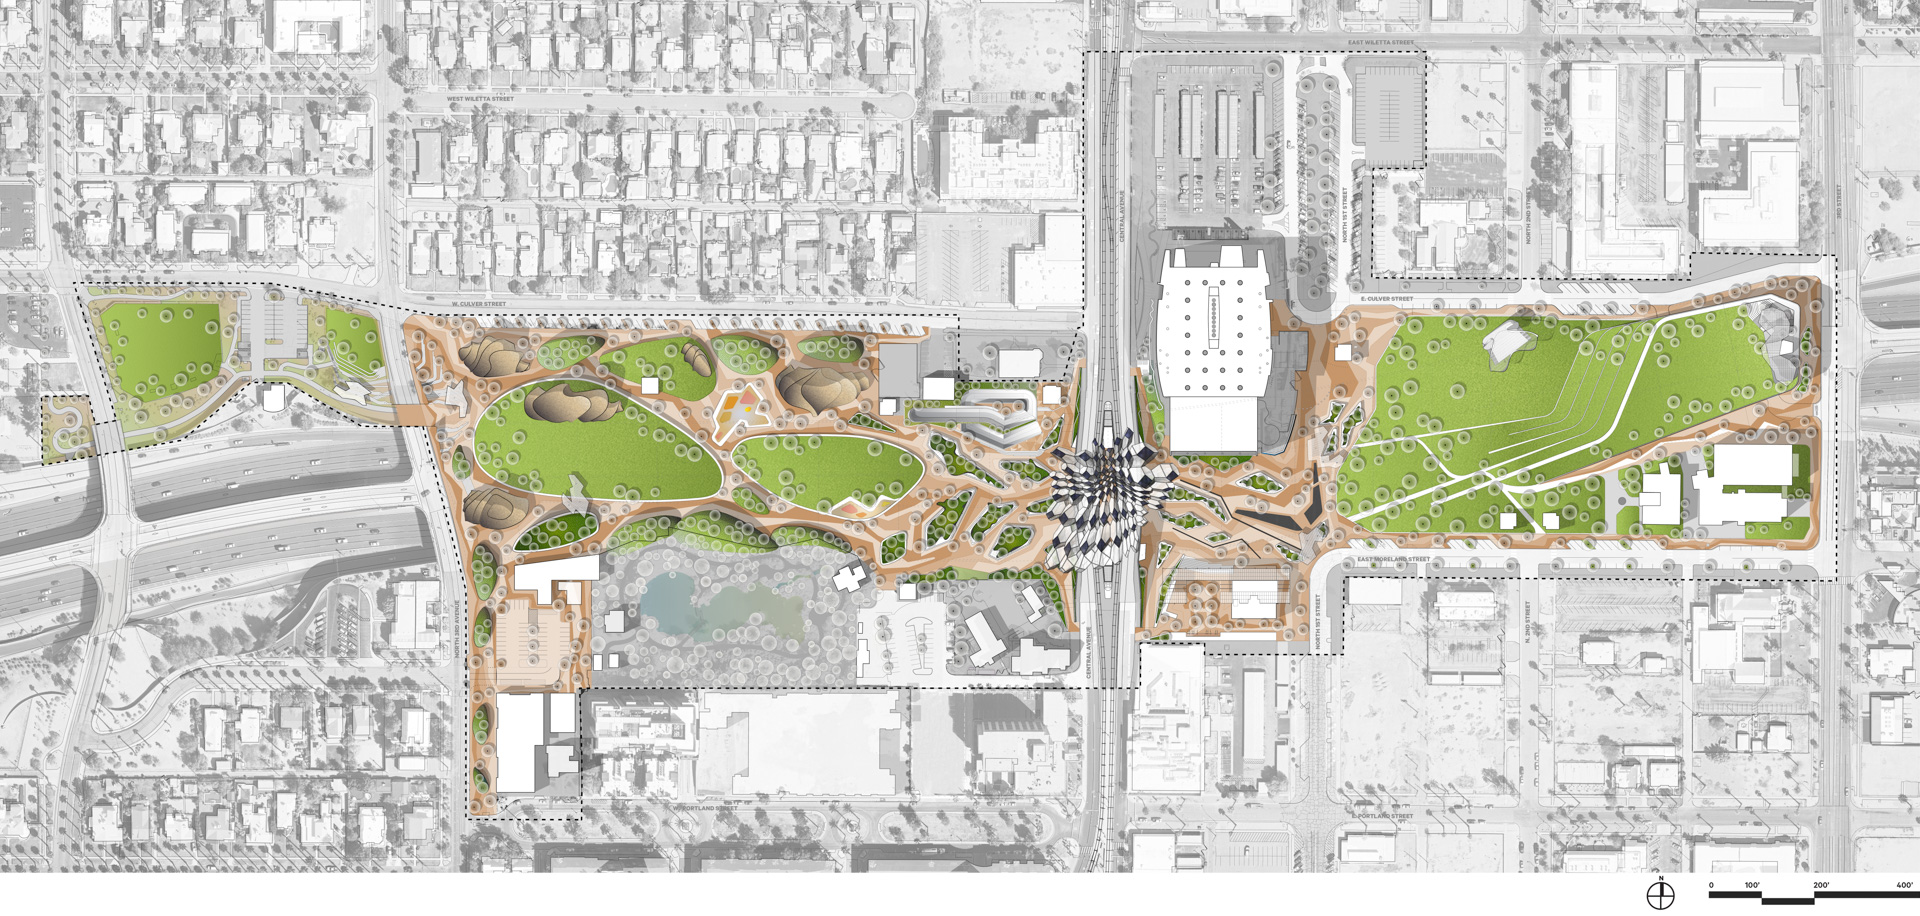 landscape-architecture-urban-design-hance-park-1.jpg